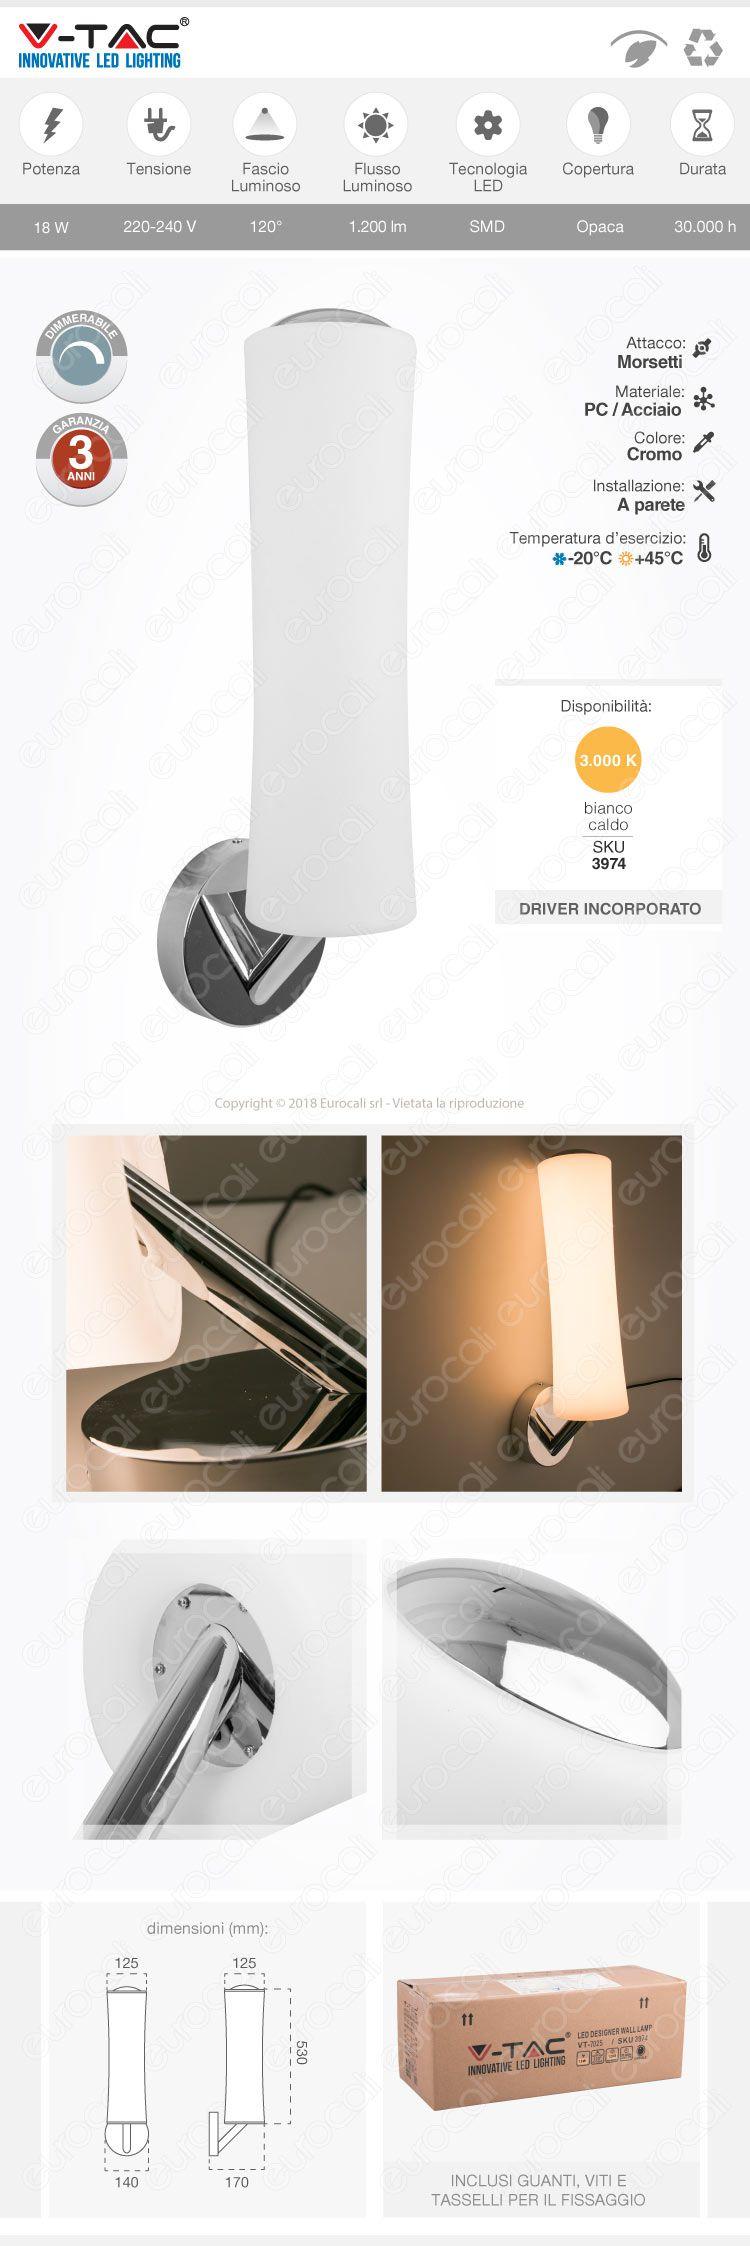 lampada led da muro